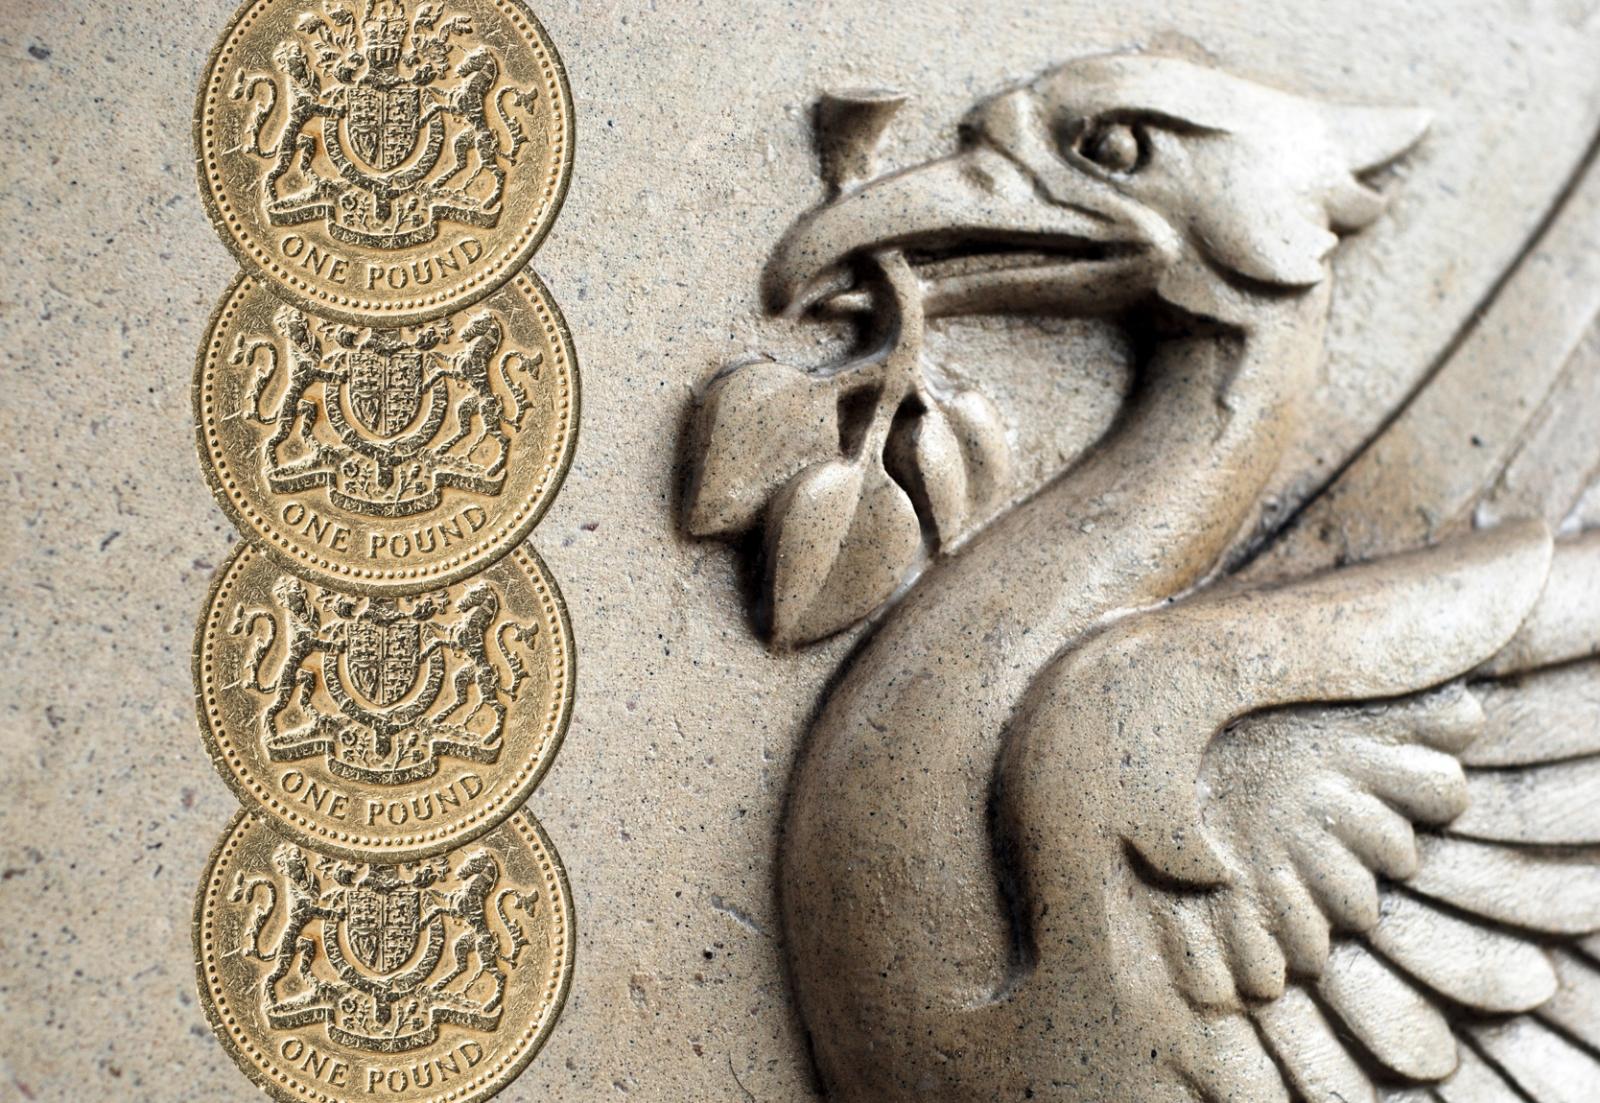 Liverpool pound